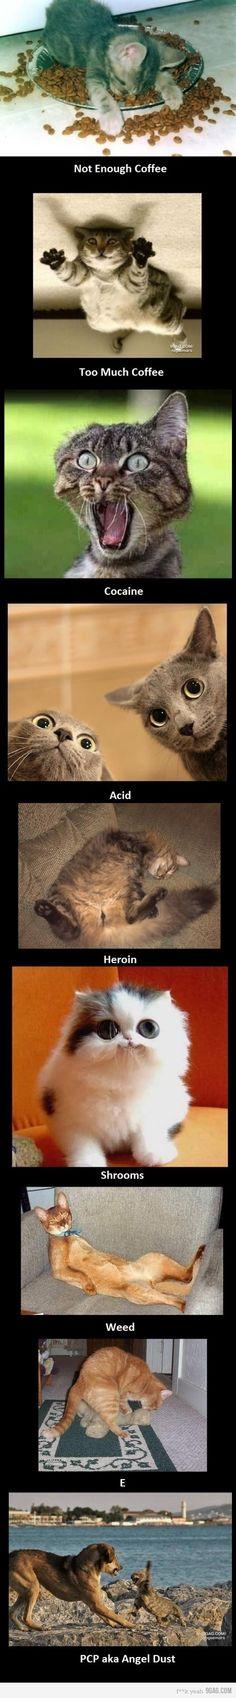 Acid.